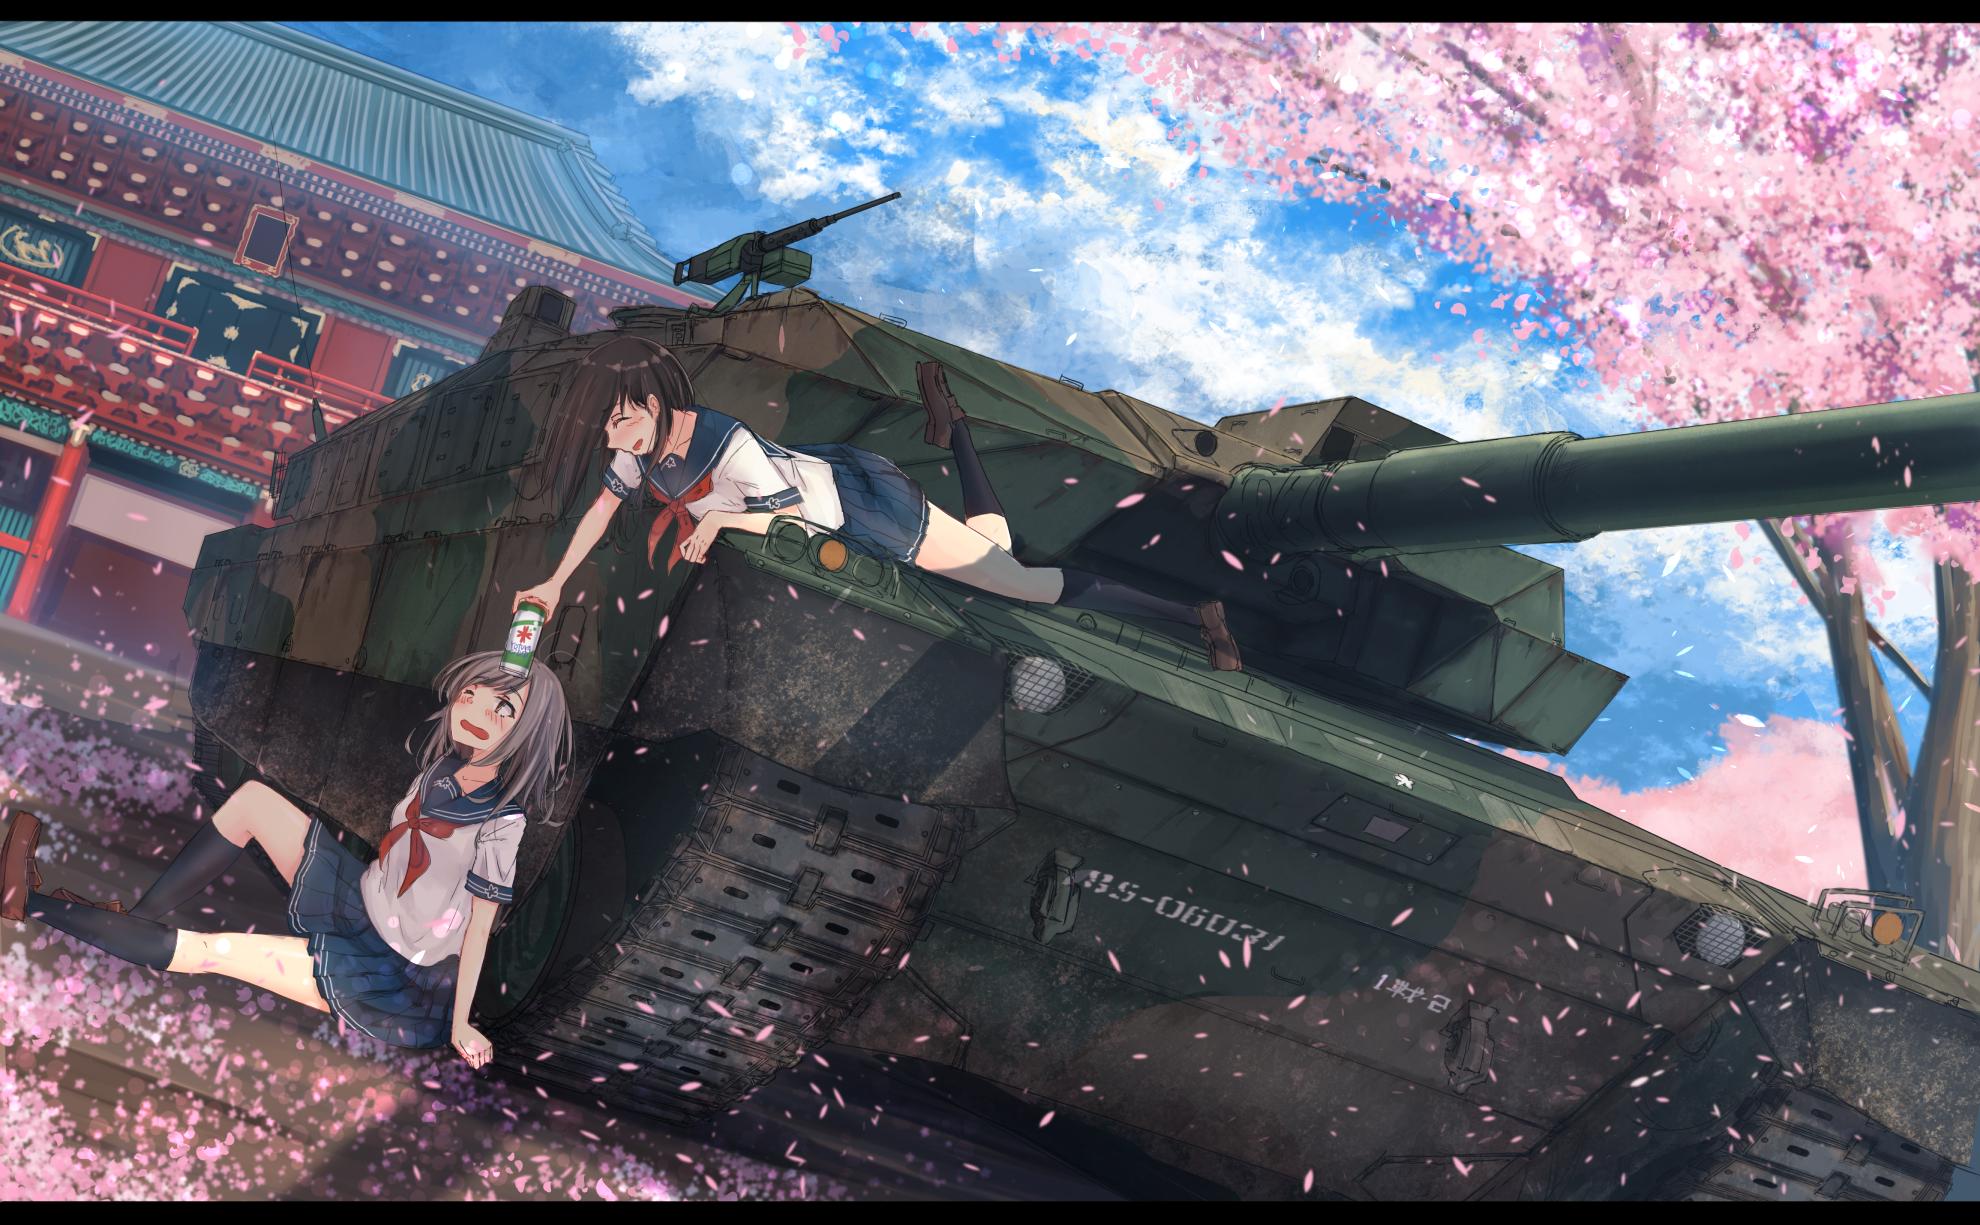 Wallpaper Anime Girls Vehicle Weapon Soldier Tank